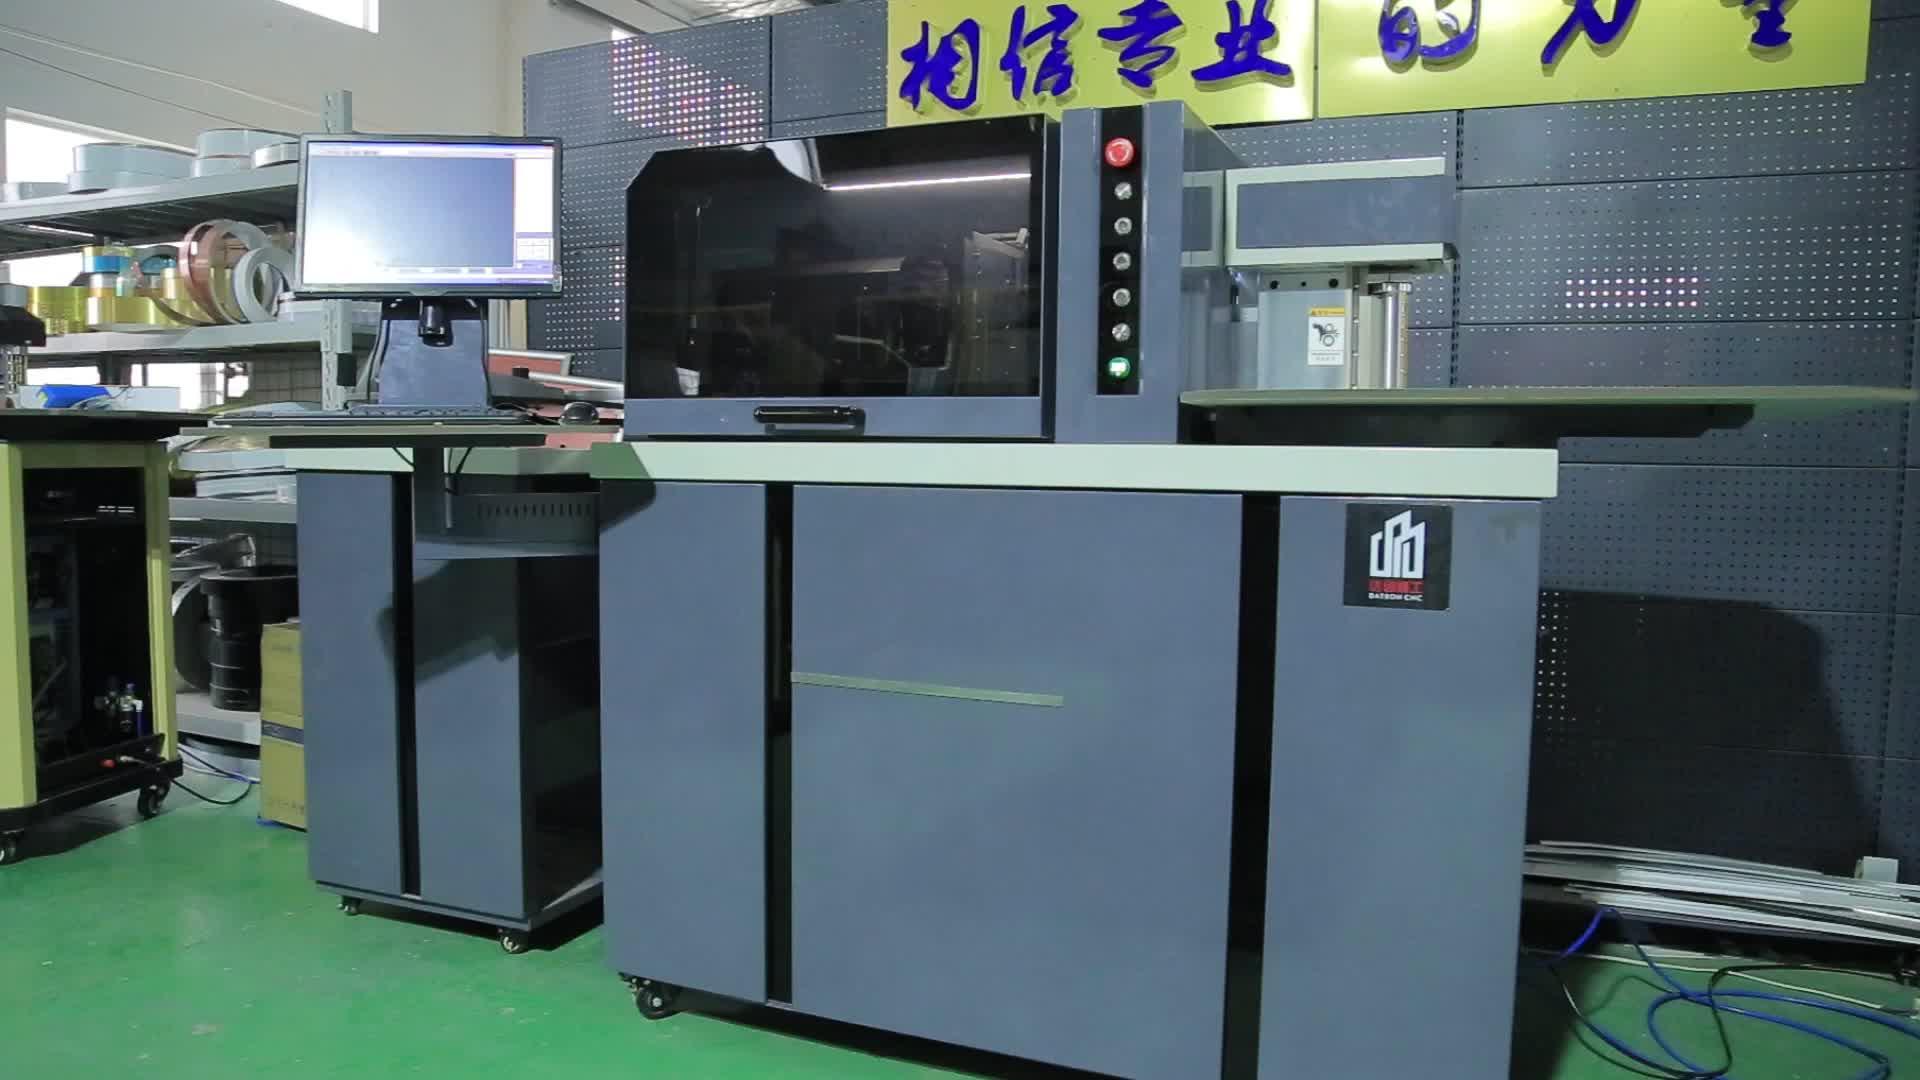 HH-NL130 Alumínio 3D Carta Canal LEVOU Sinais Carta Canal Bender CNC Máquina de Dobra